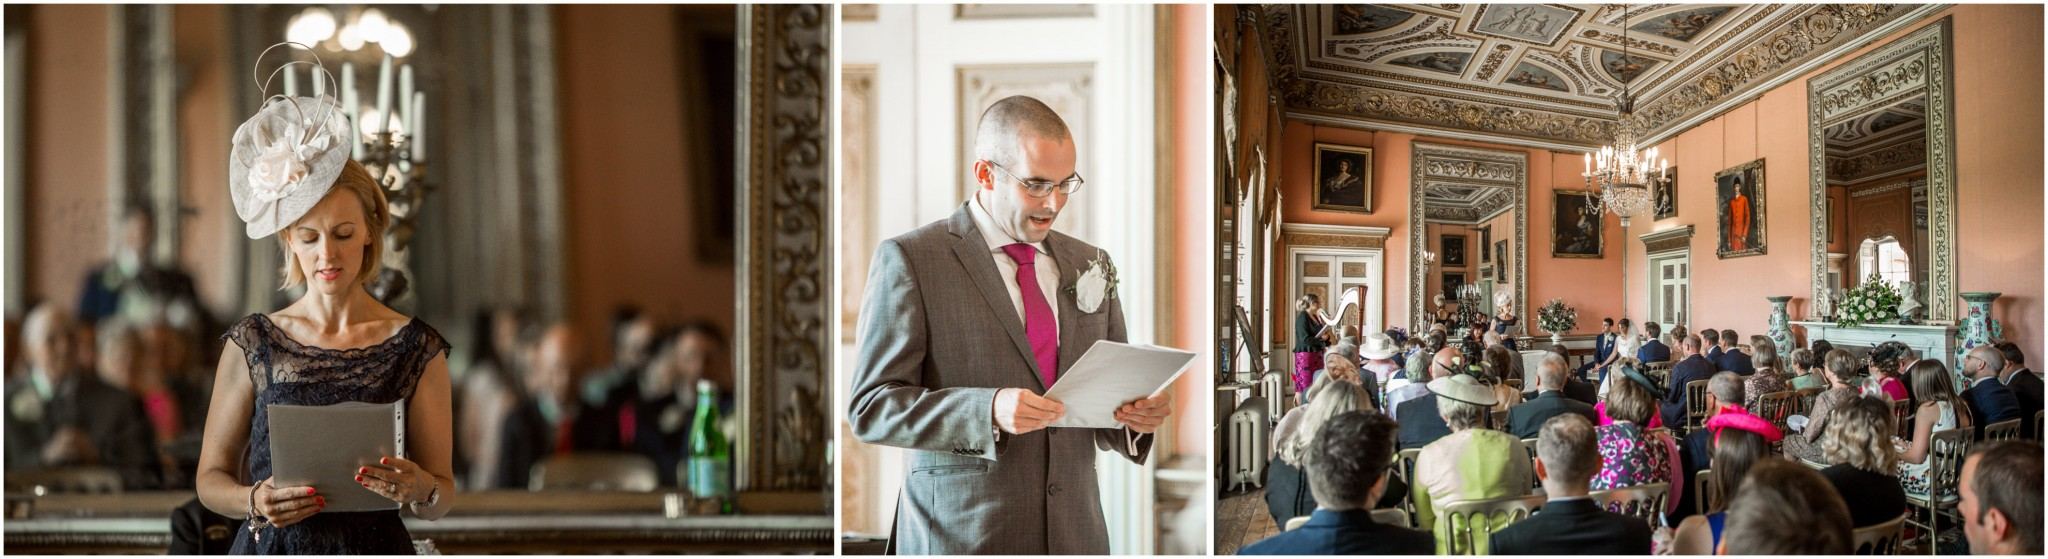 Avington Park Wedding Readings